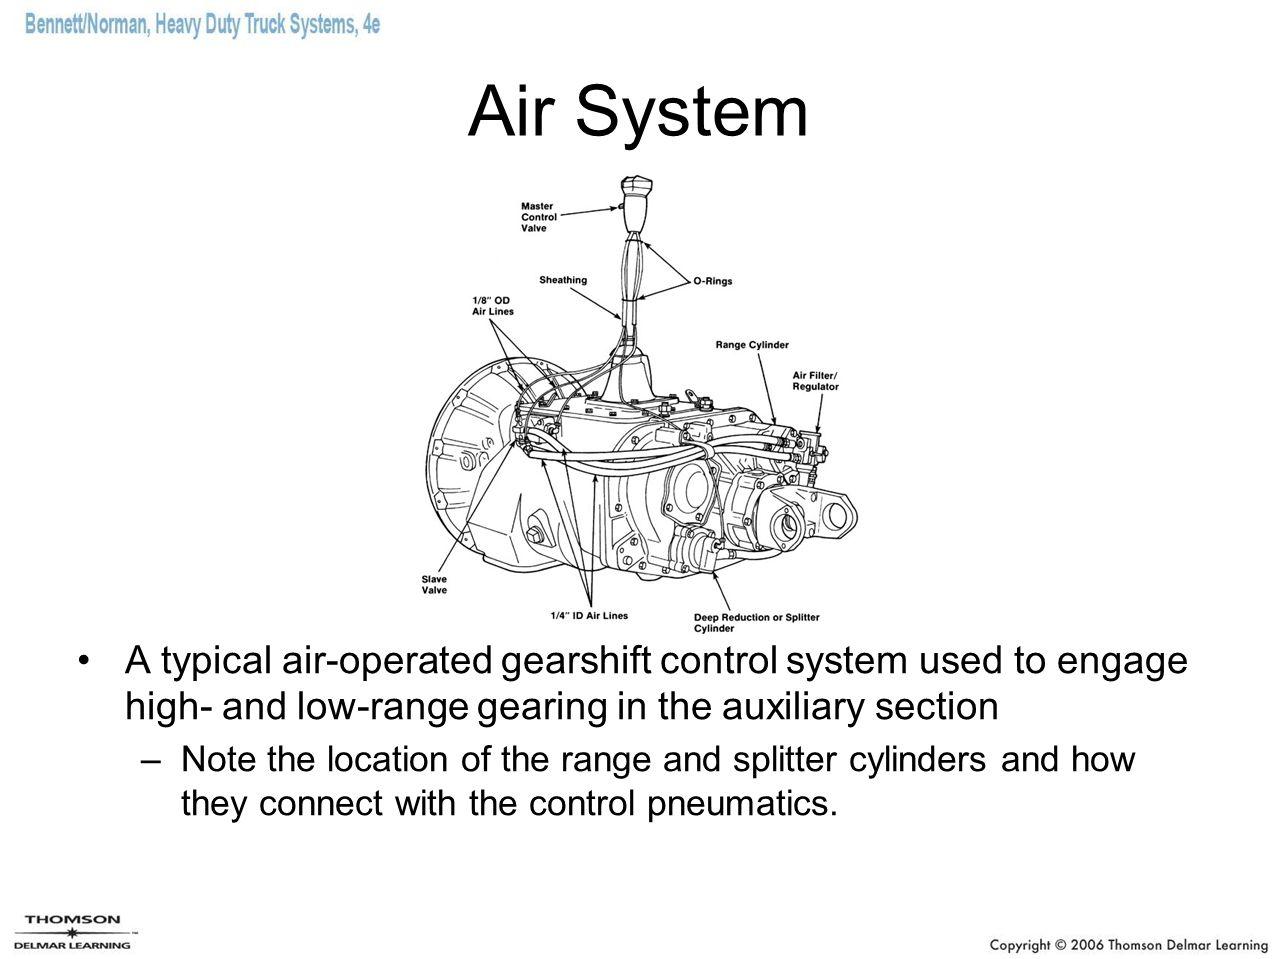 Air Shift Diagram - Electricity Site